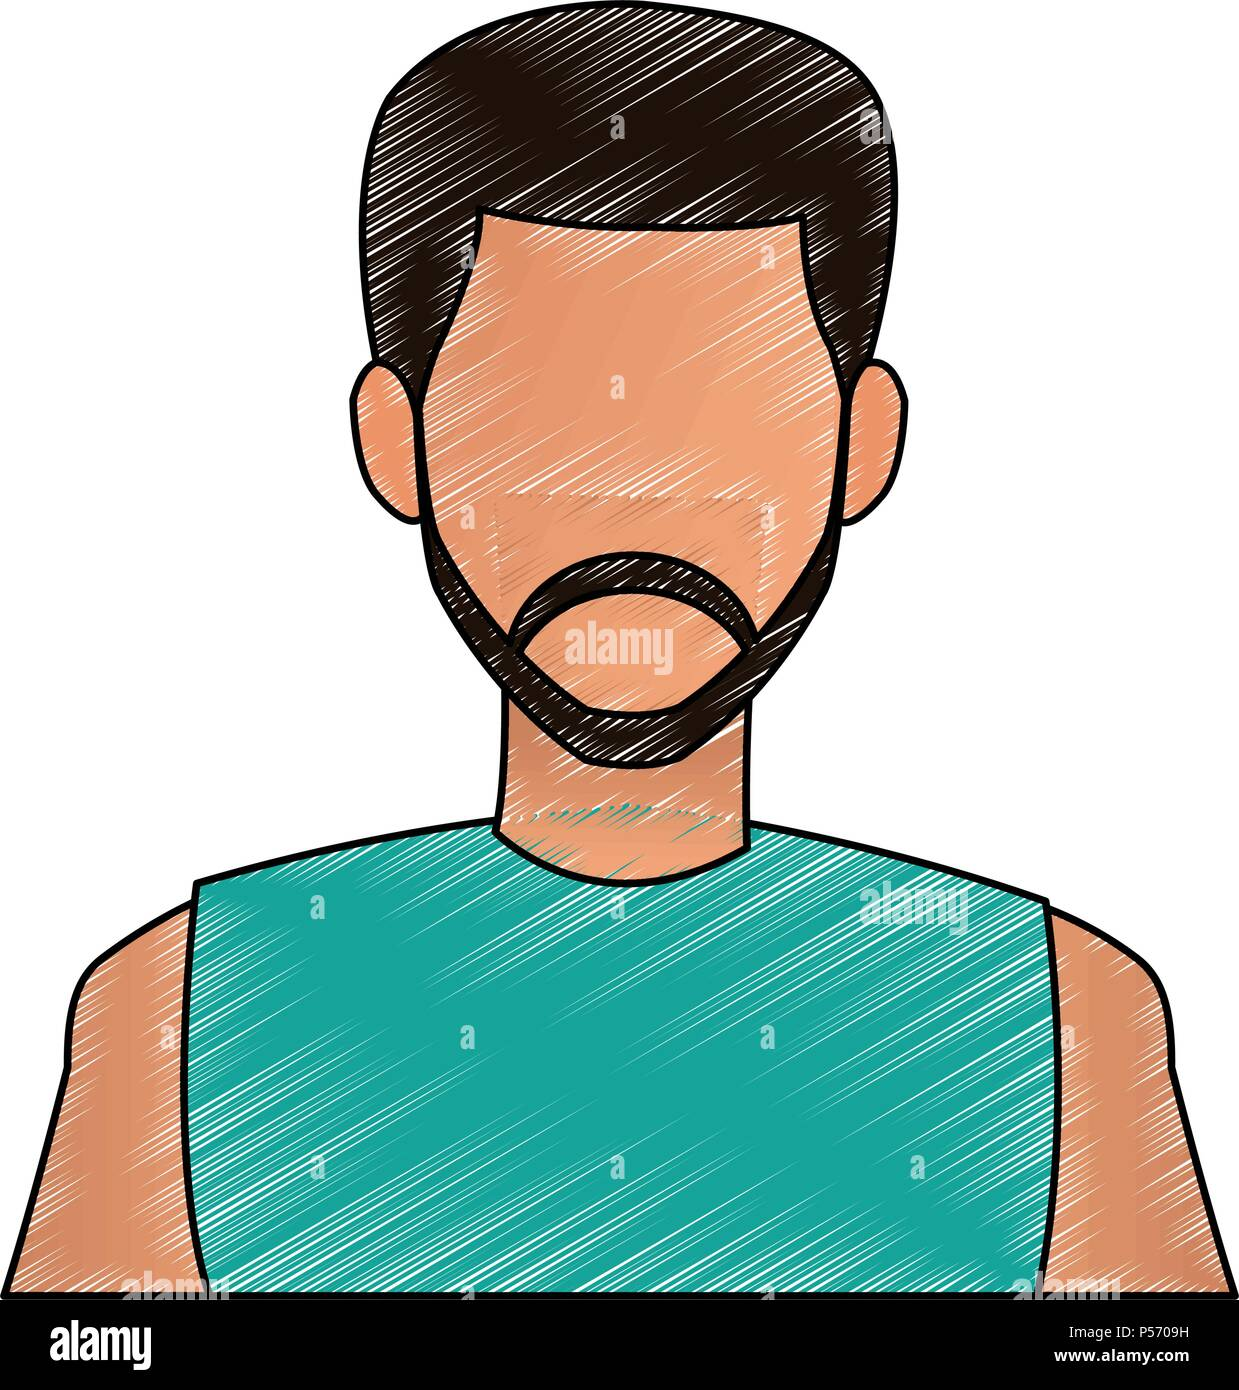 Mna faceless profile scribble - Stock Image